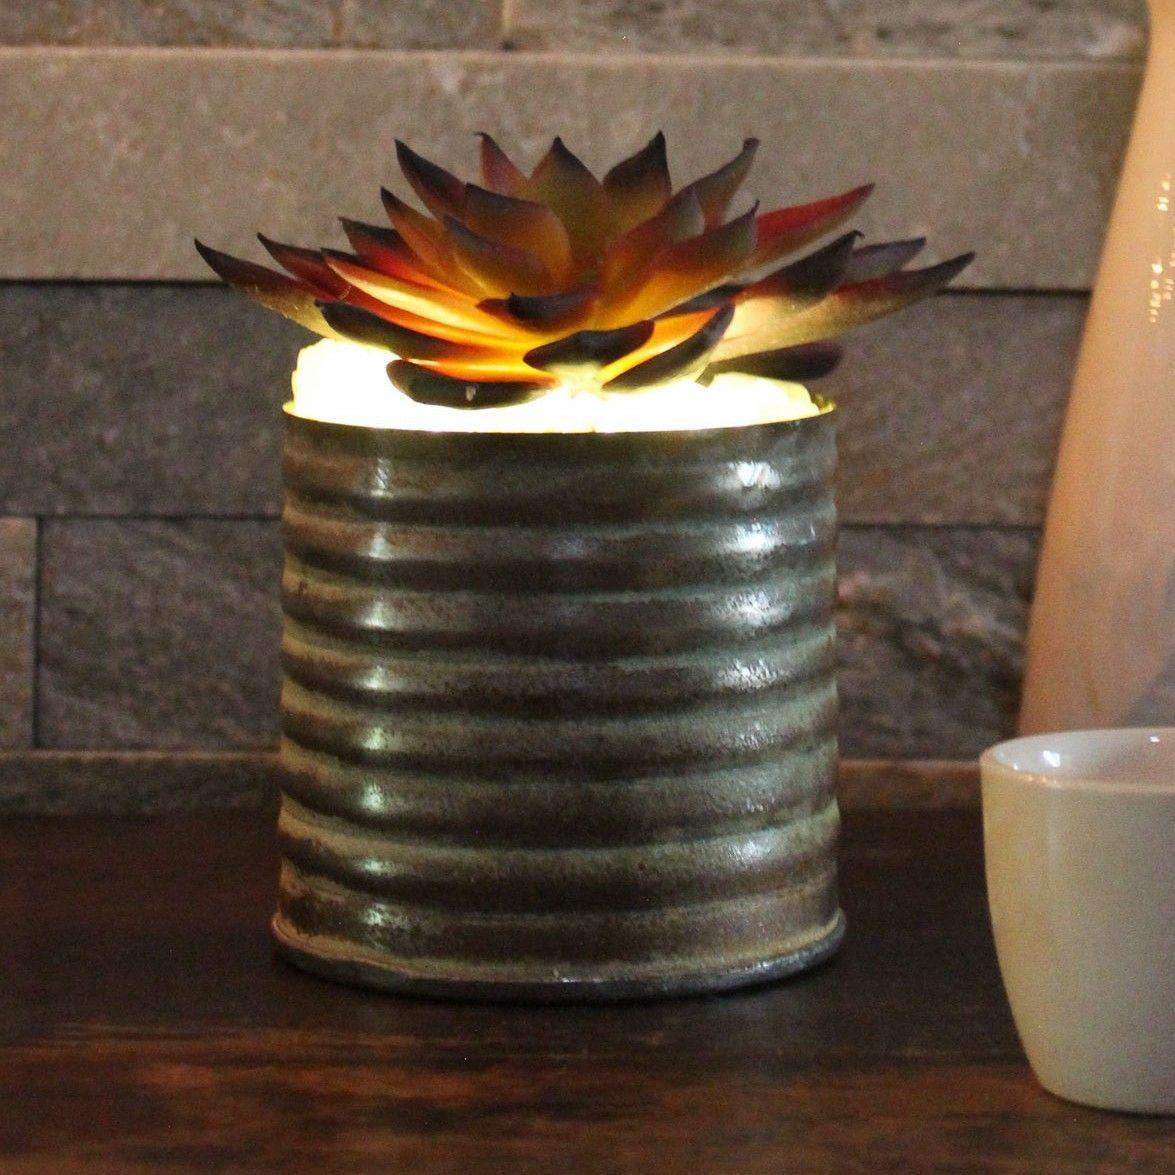 Artificial Burgundy Echeveria Succulent Desk Top Plant in Decorative Vase